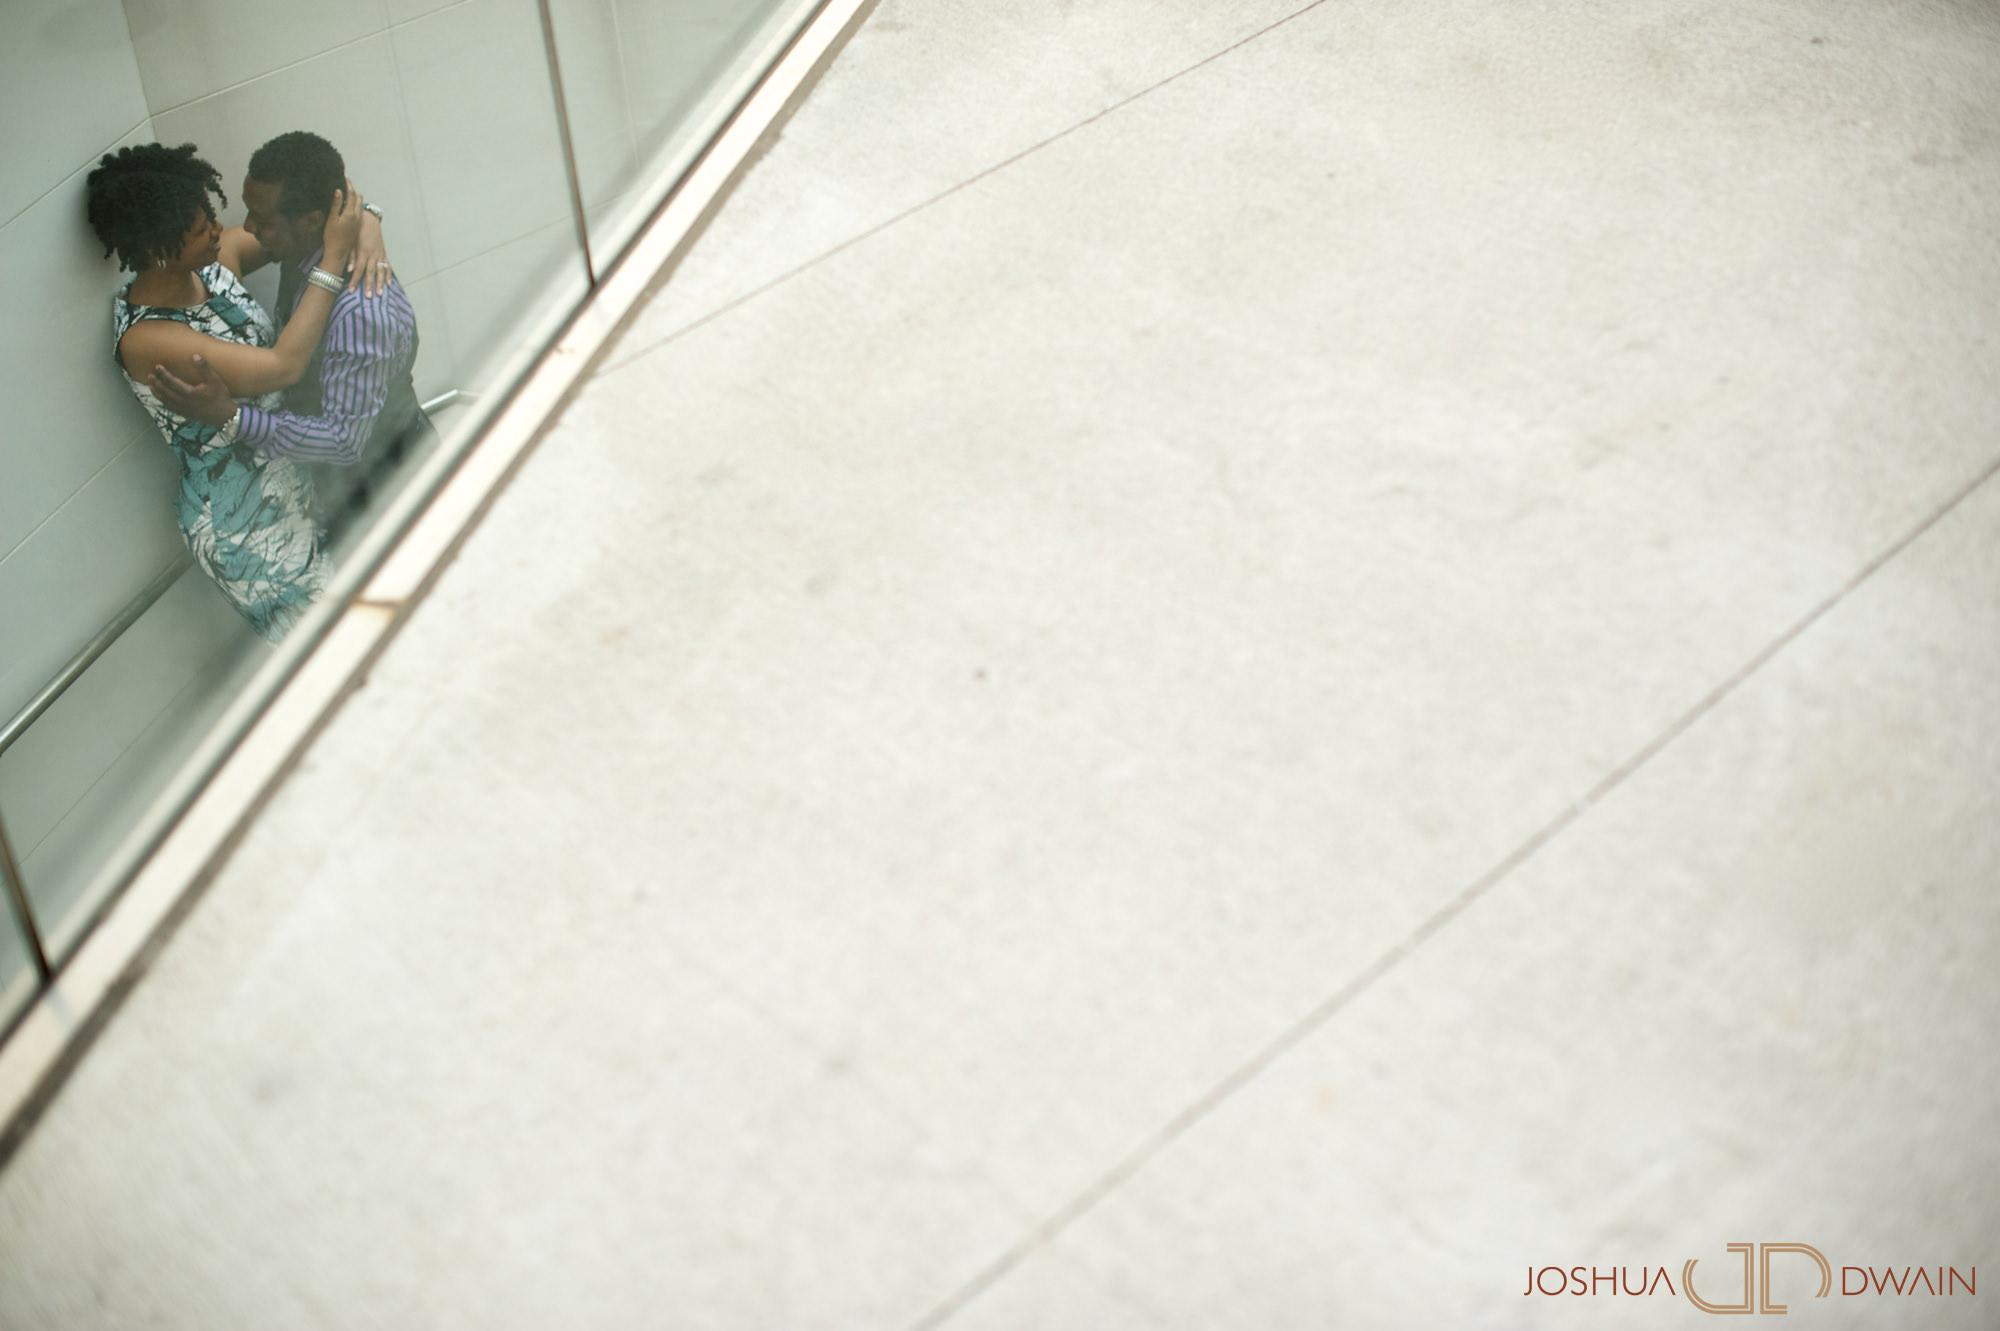 betty-garnel-006-central-park-new-york-city-ny-engagement-photographer-joshua-dwain-20110527_bg_050